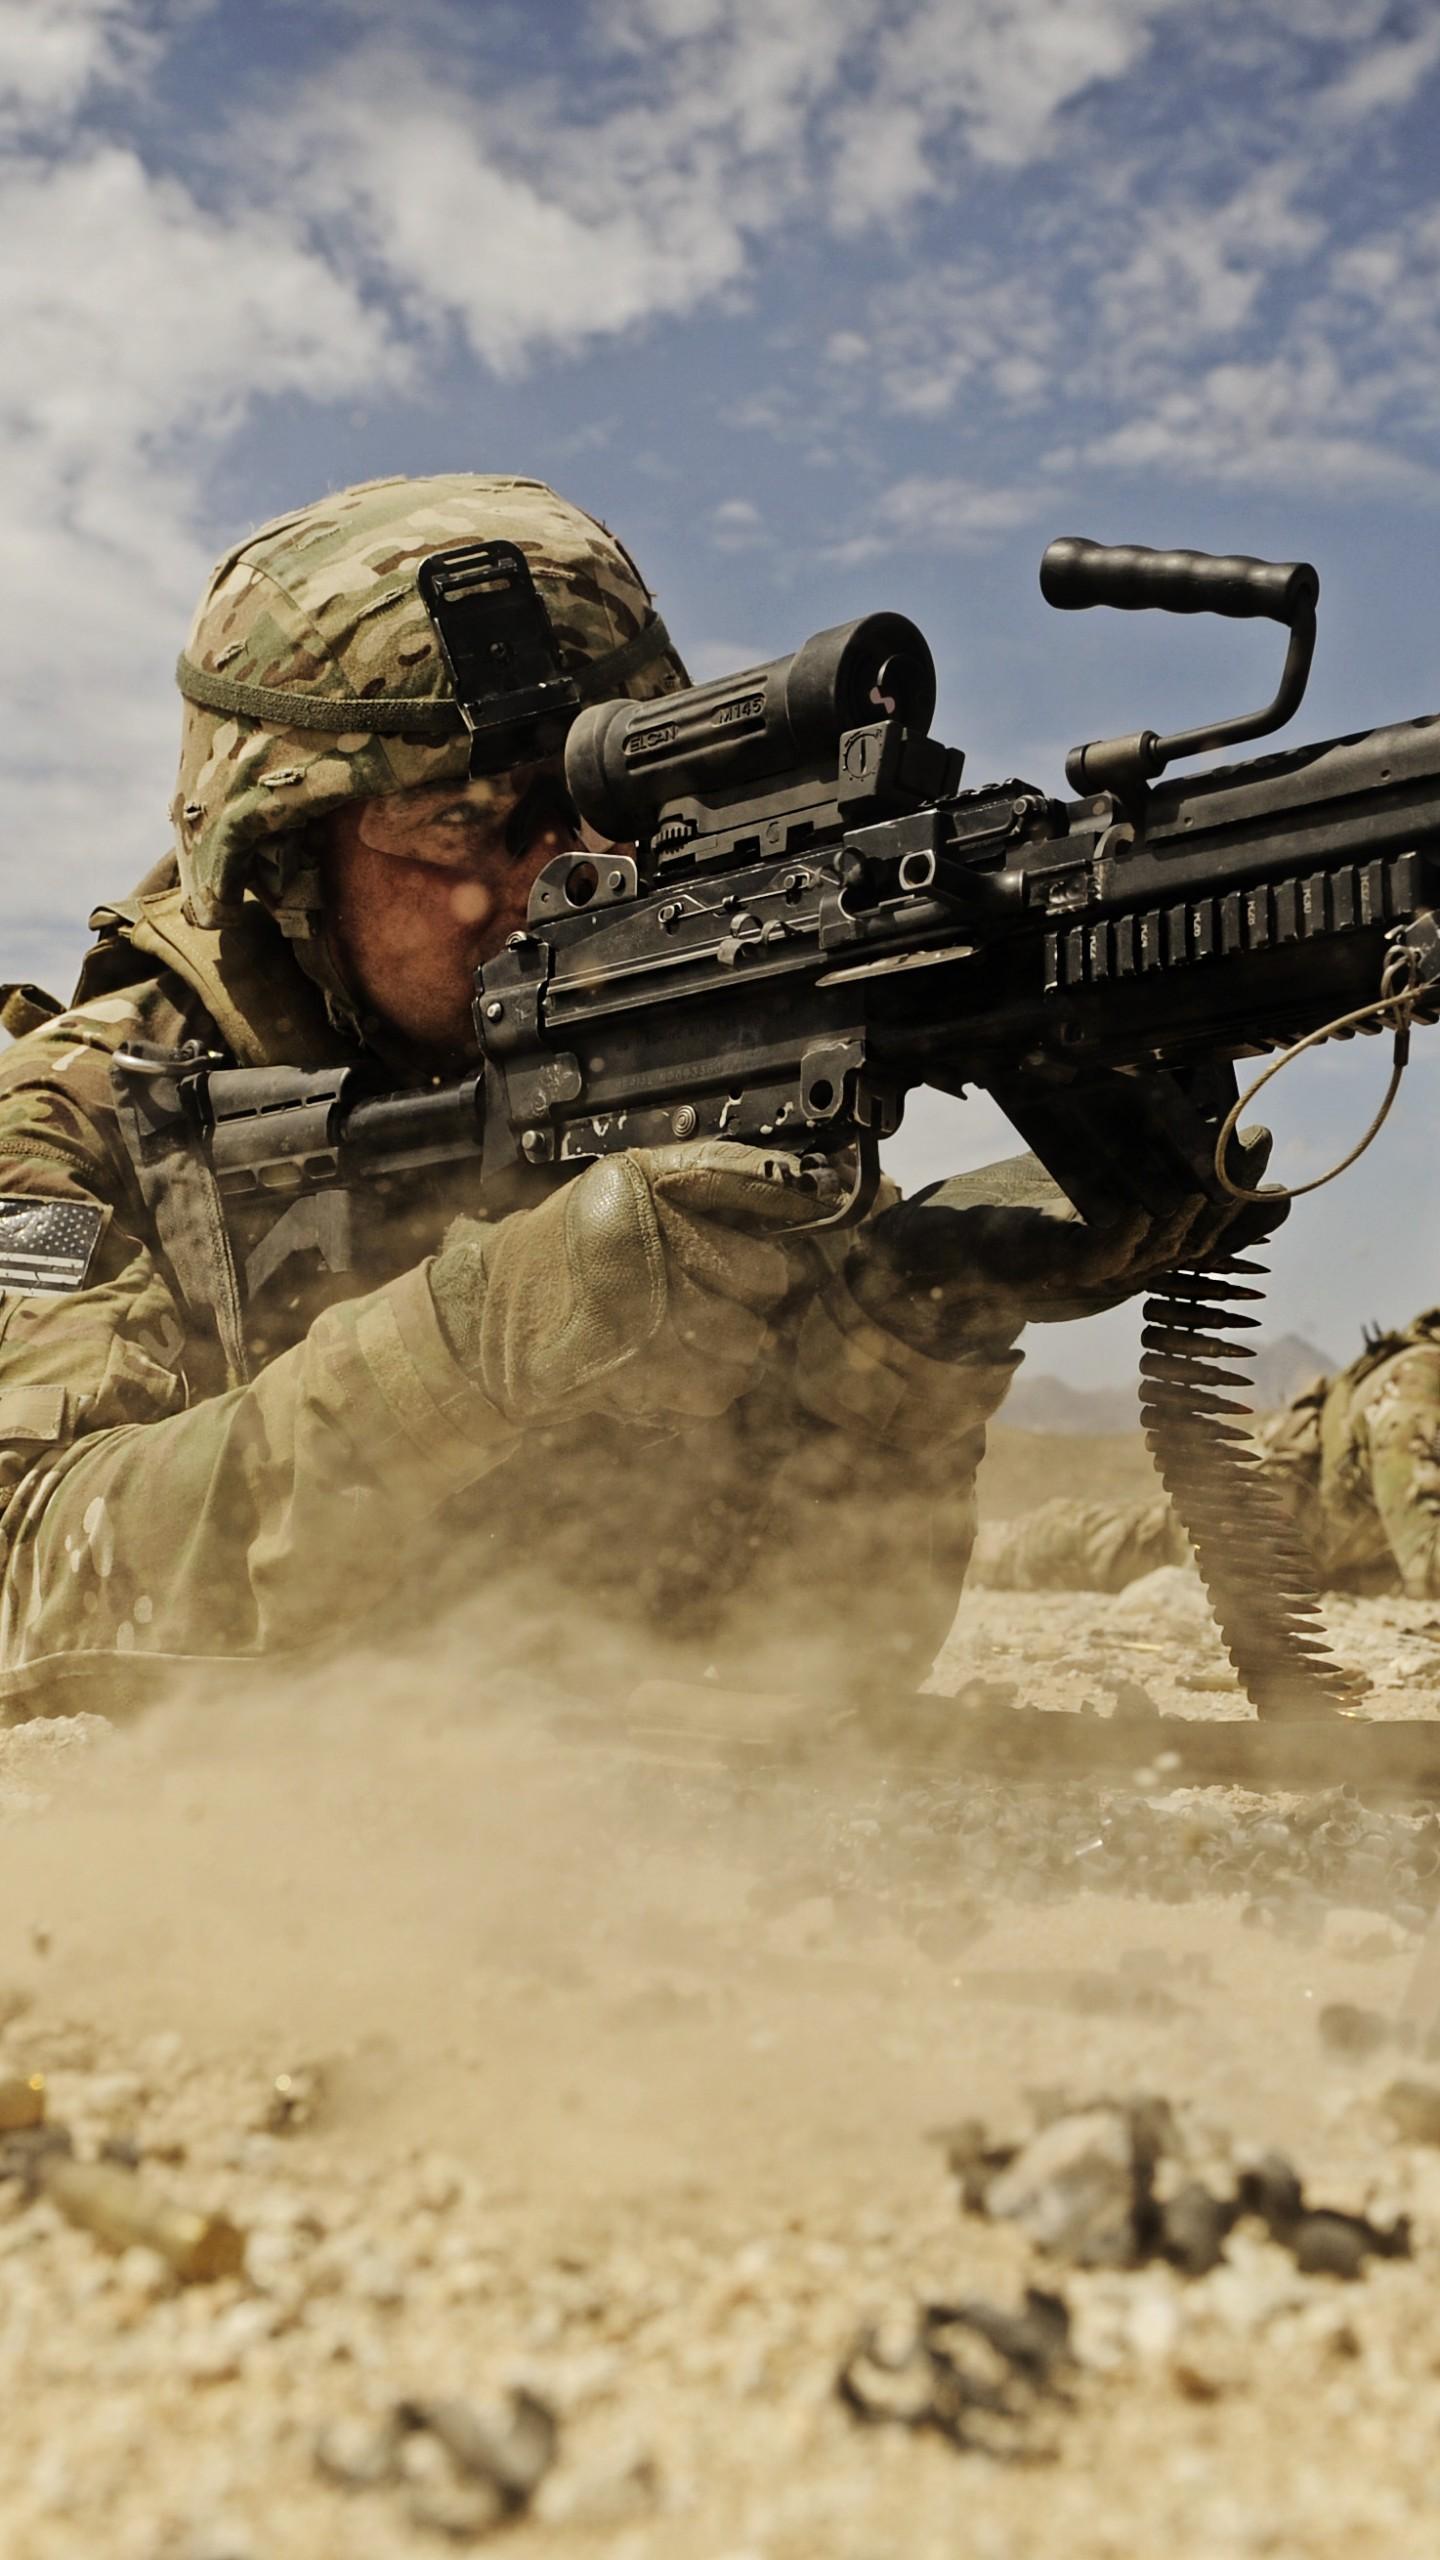 Wallpaper Soldier M249 Lmg Machine Gun U S Army Firing